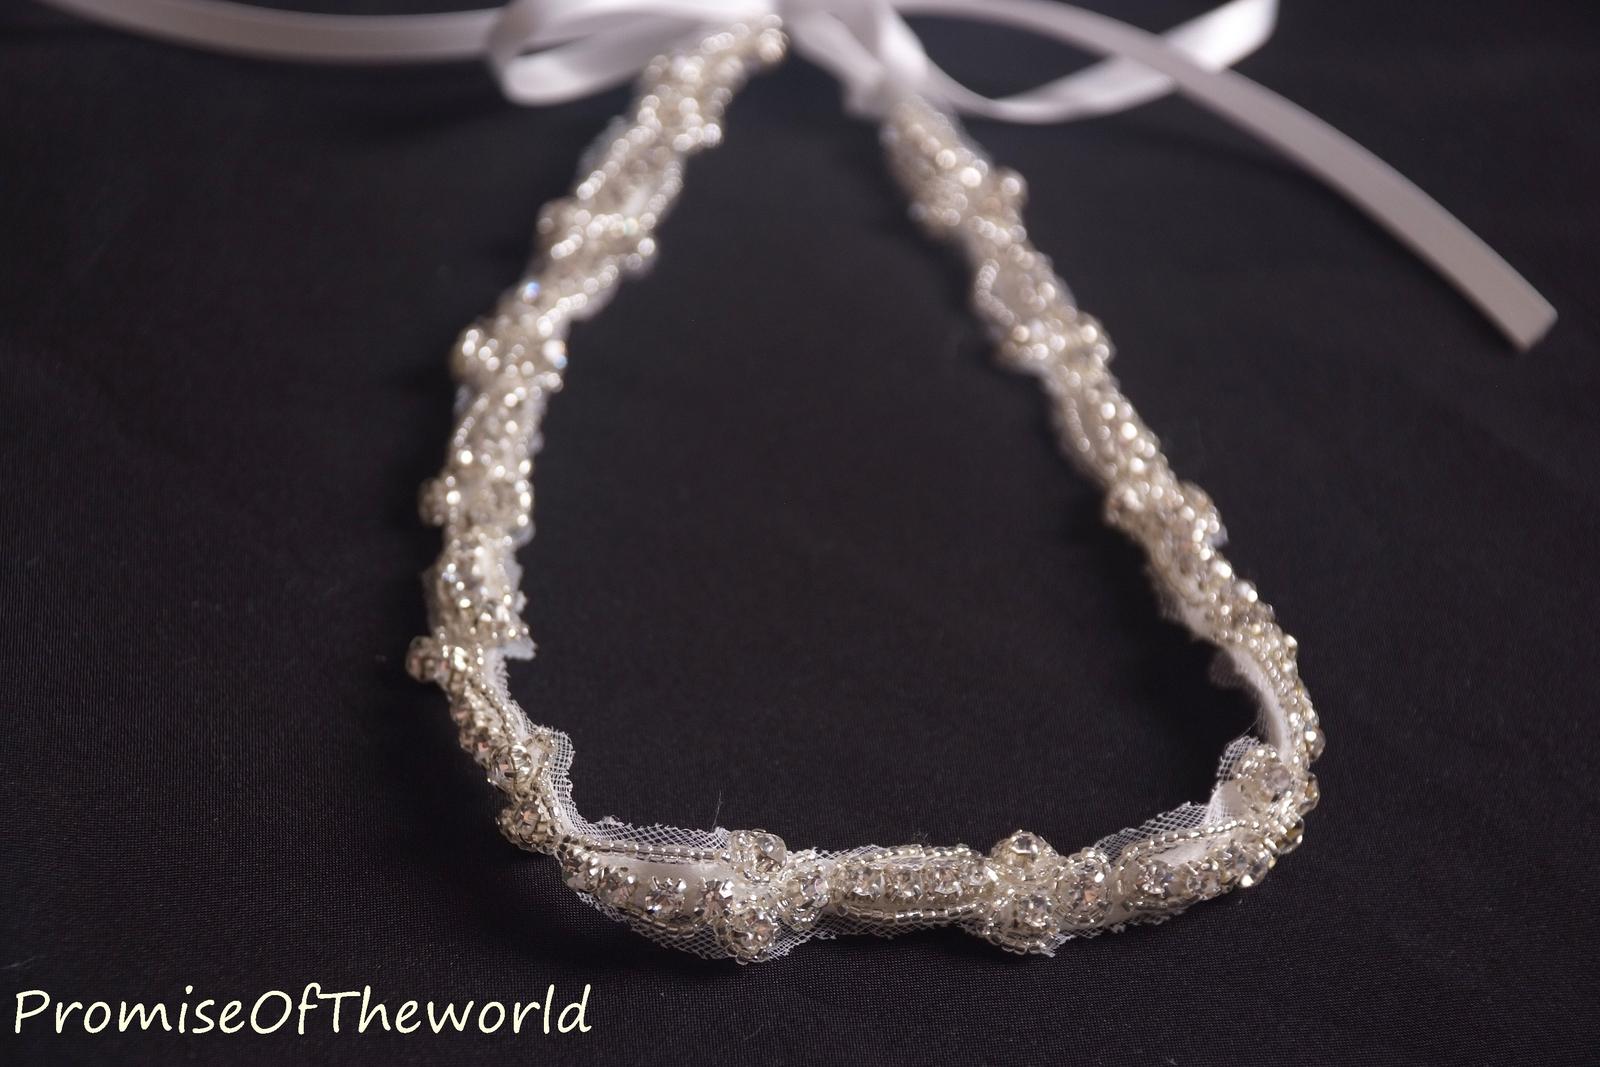 Rulou belt ribbon beading crystals & pearls waist sash for wedding dress